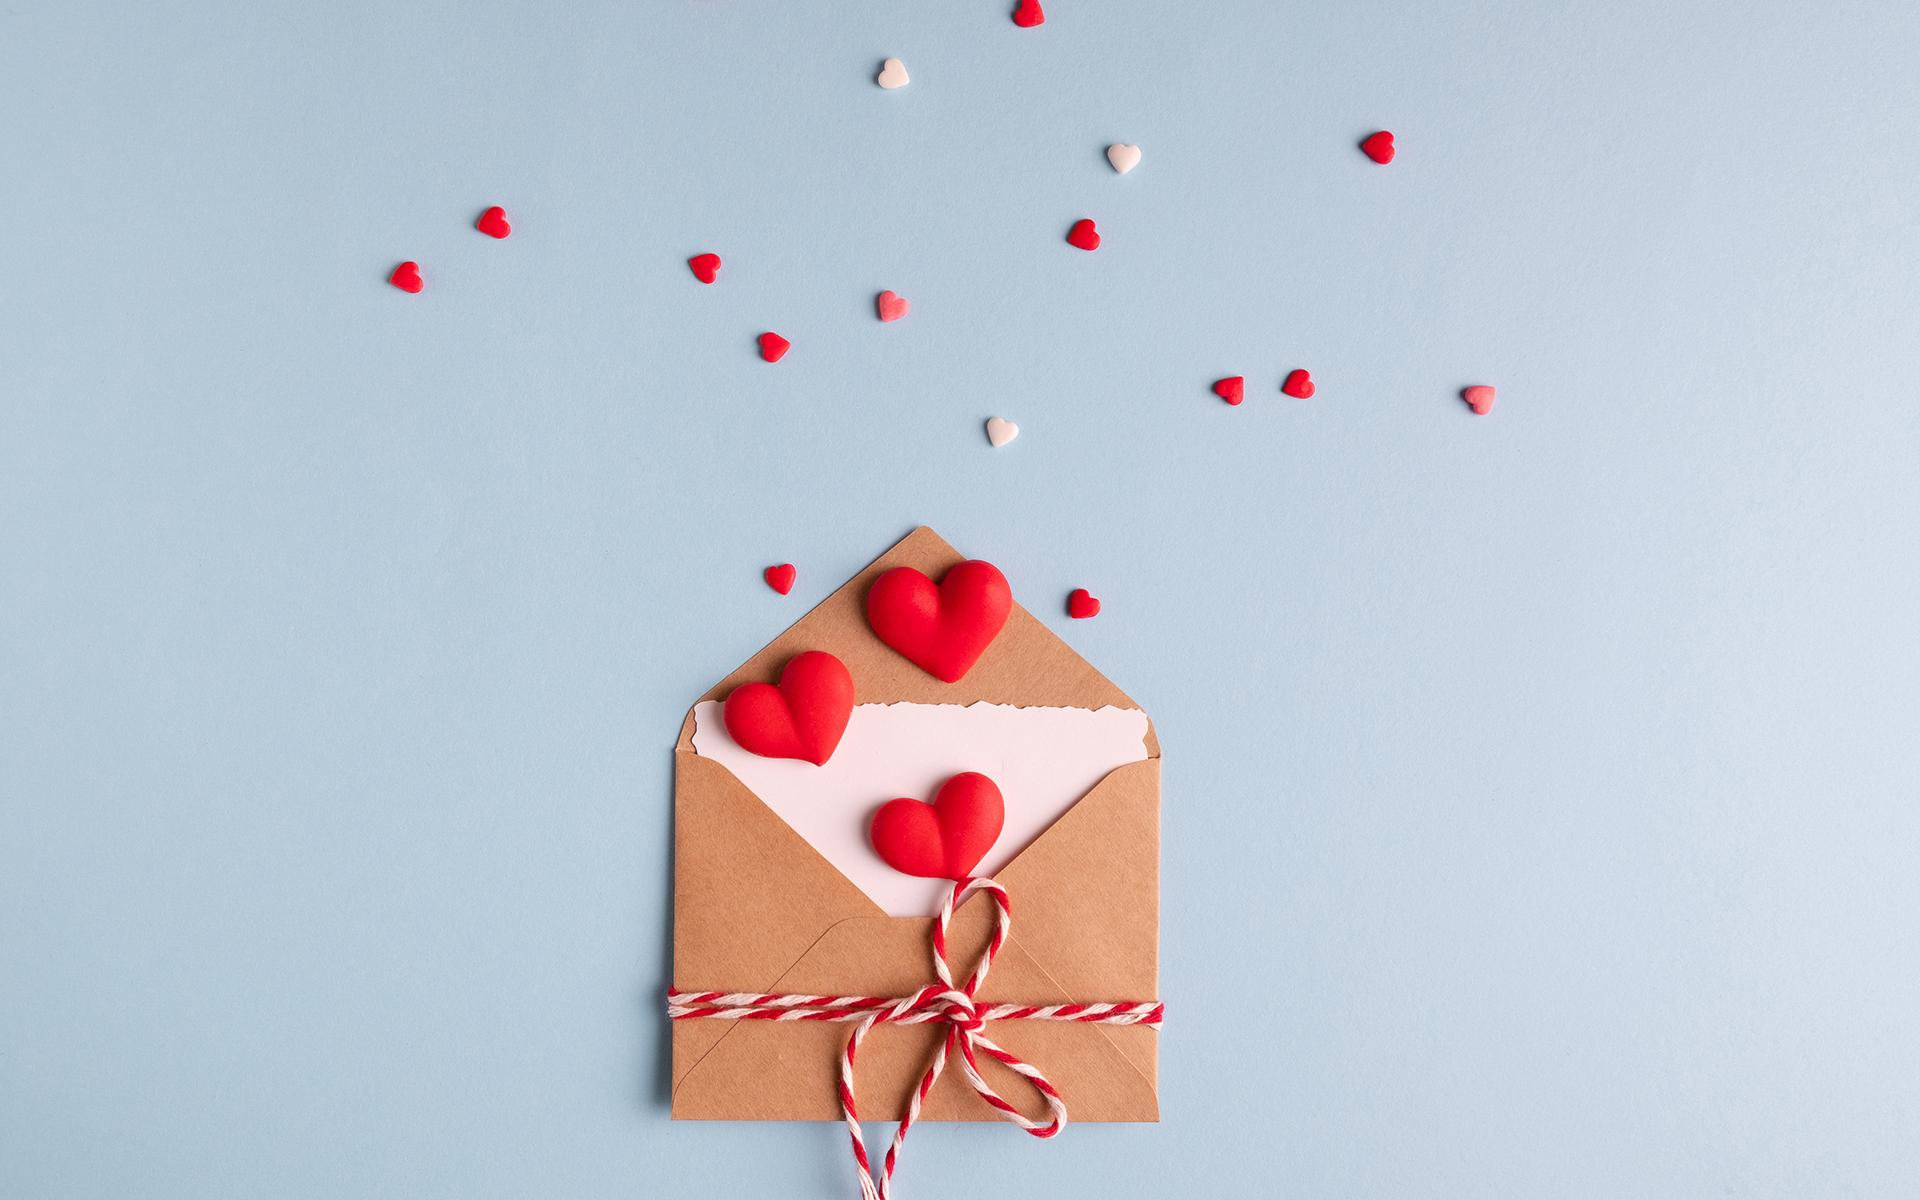 Love Letter Guided Meditation - Minimal valentine day concept. Valentine's day love letter postcard